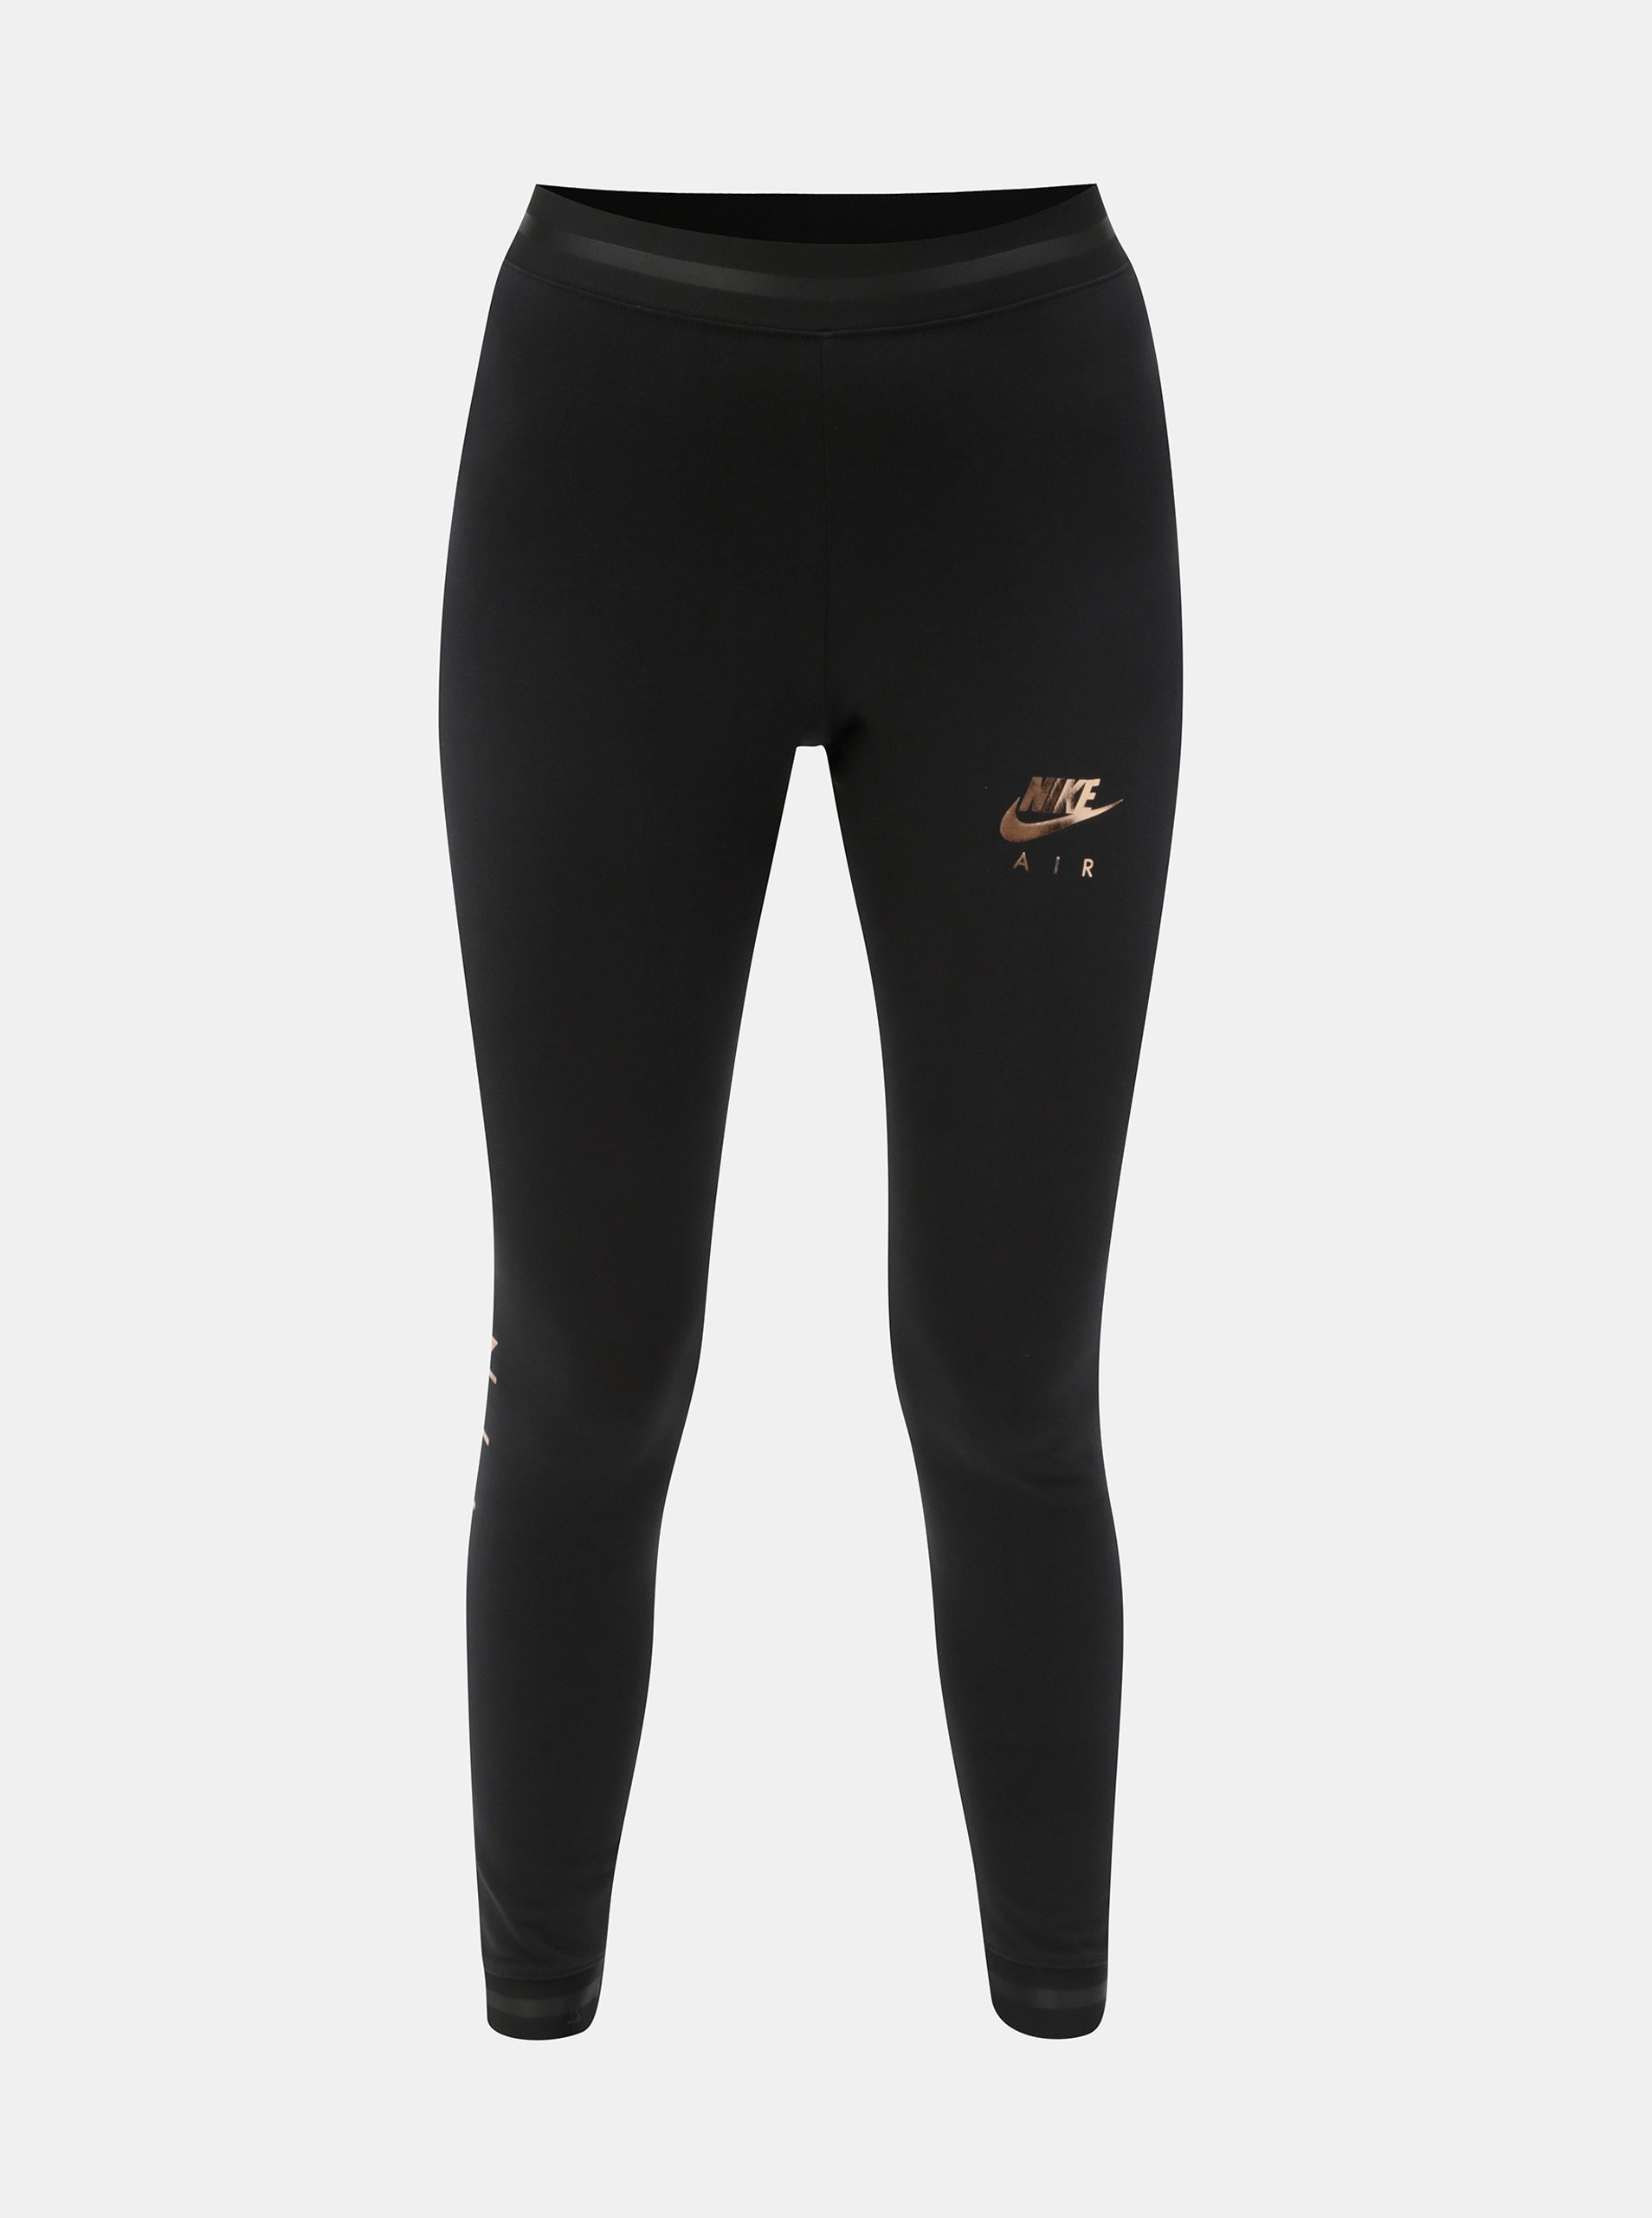 Čierne dámske legíny s potlačou Nike Air  daadff5efdb